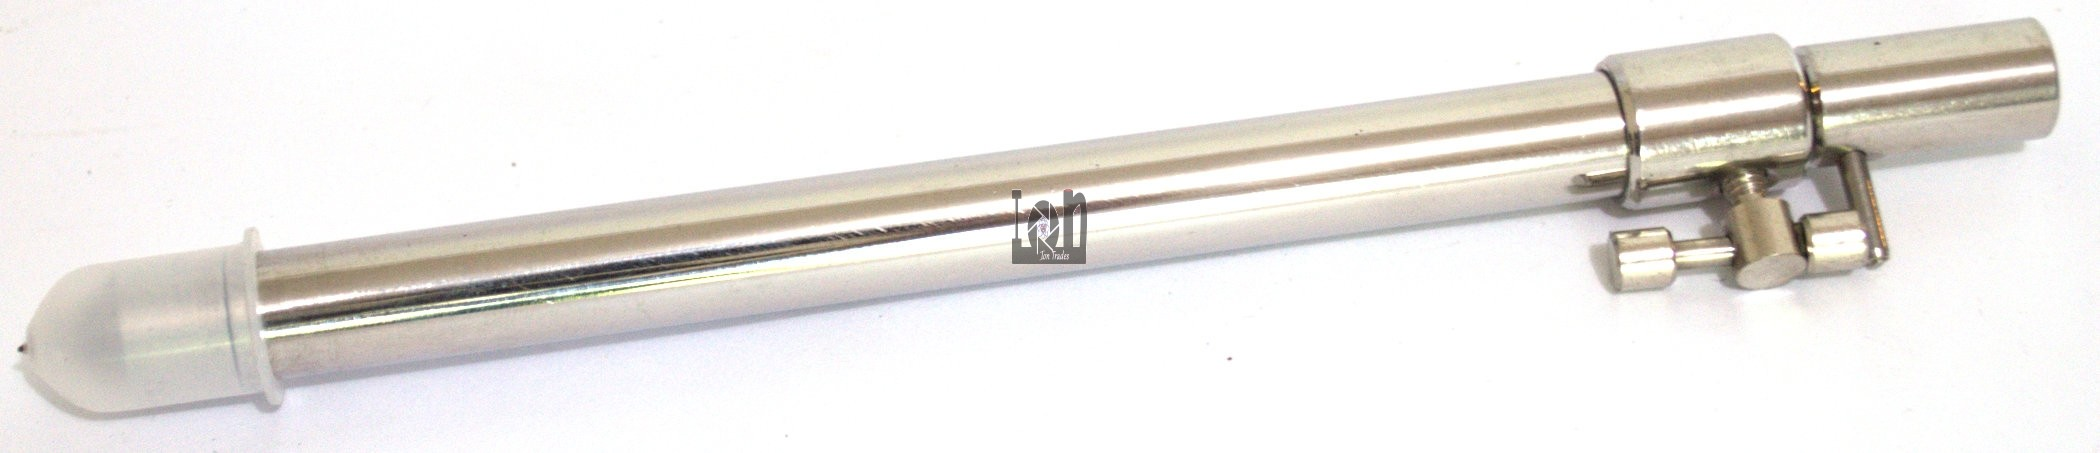 Stainless Steel Bank Stick Fishing Supplies 20-35cm T-Lock